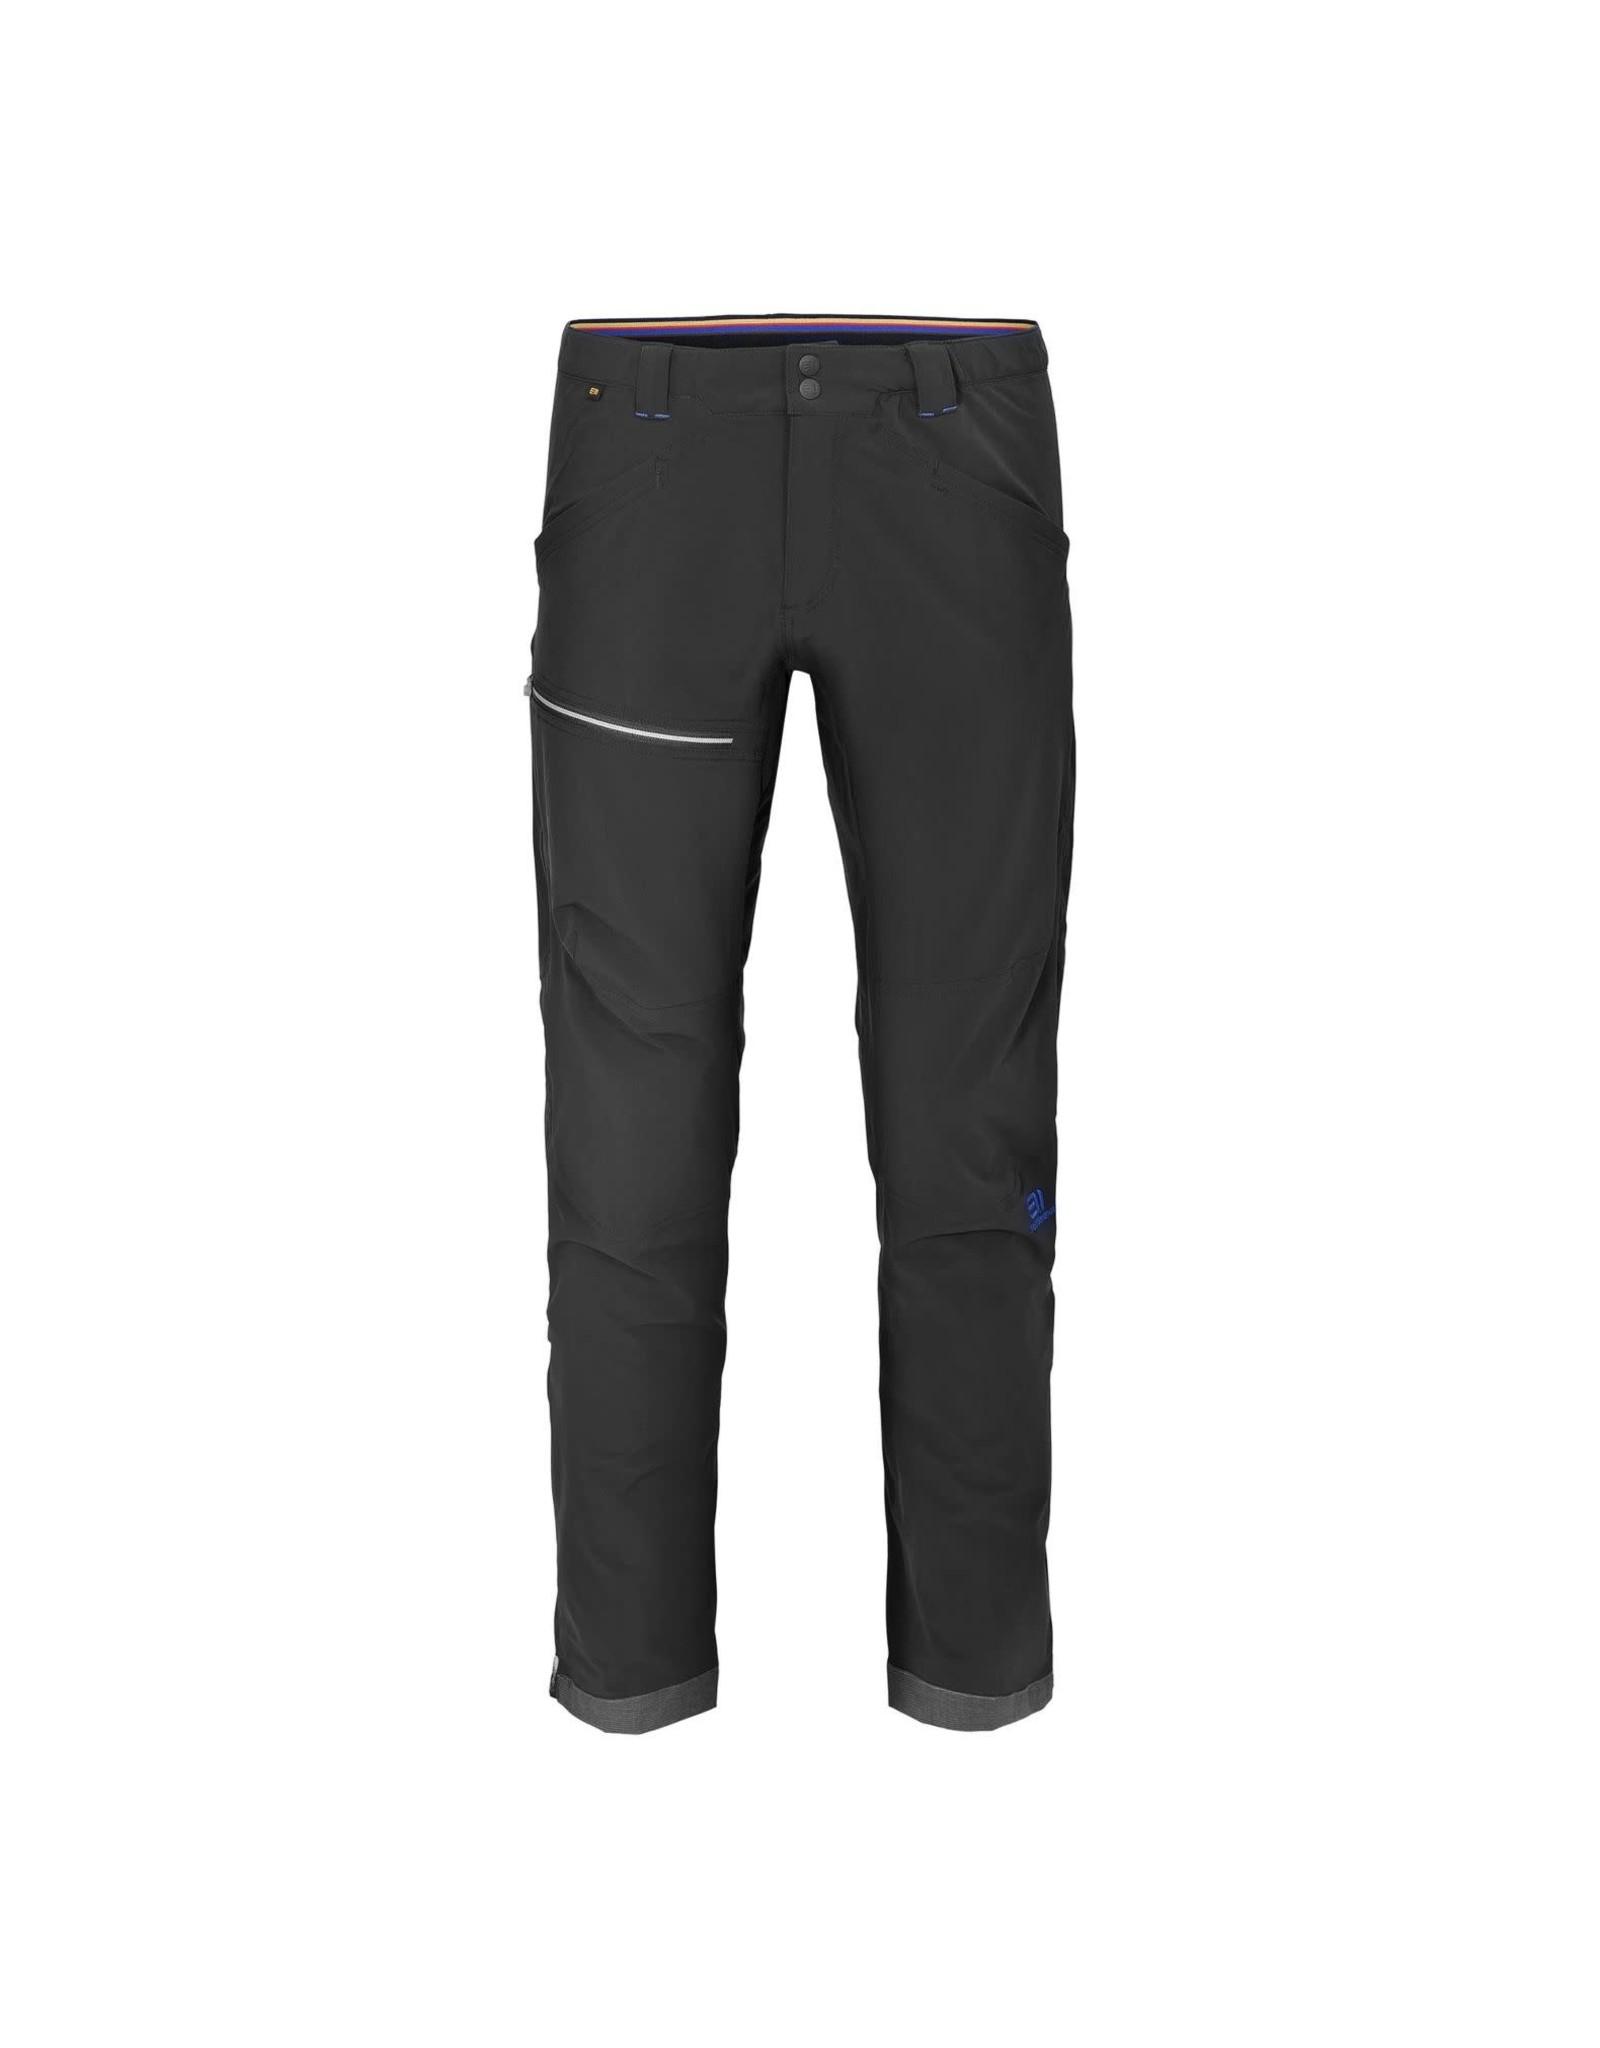 Elevenate Versatility Pants